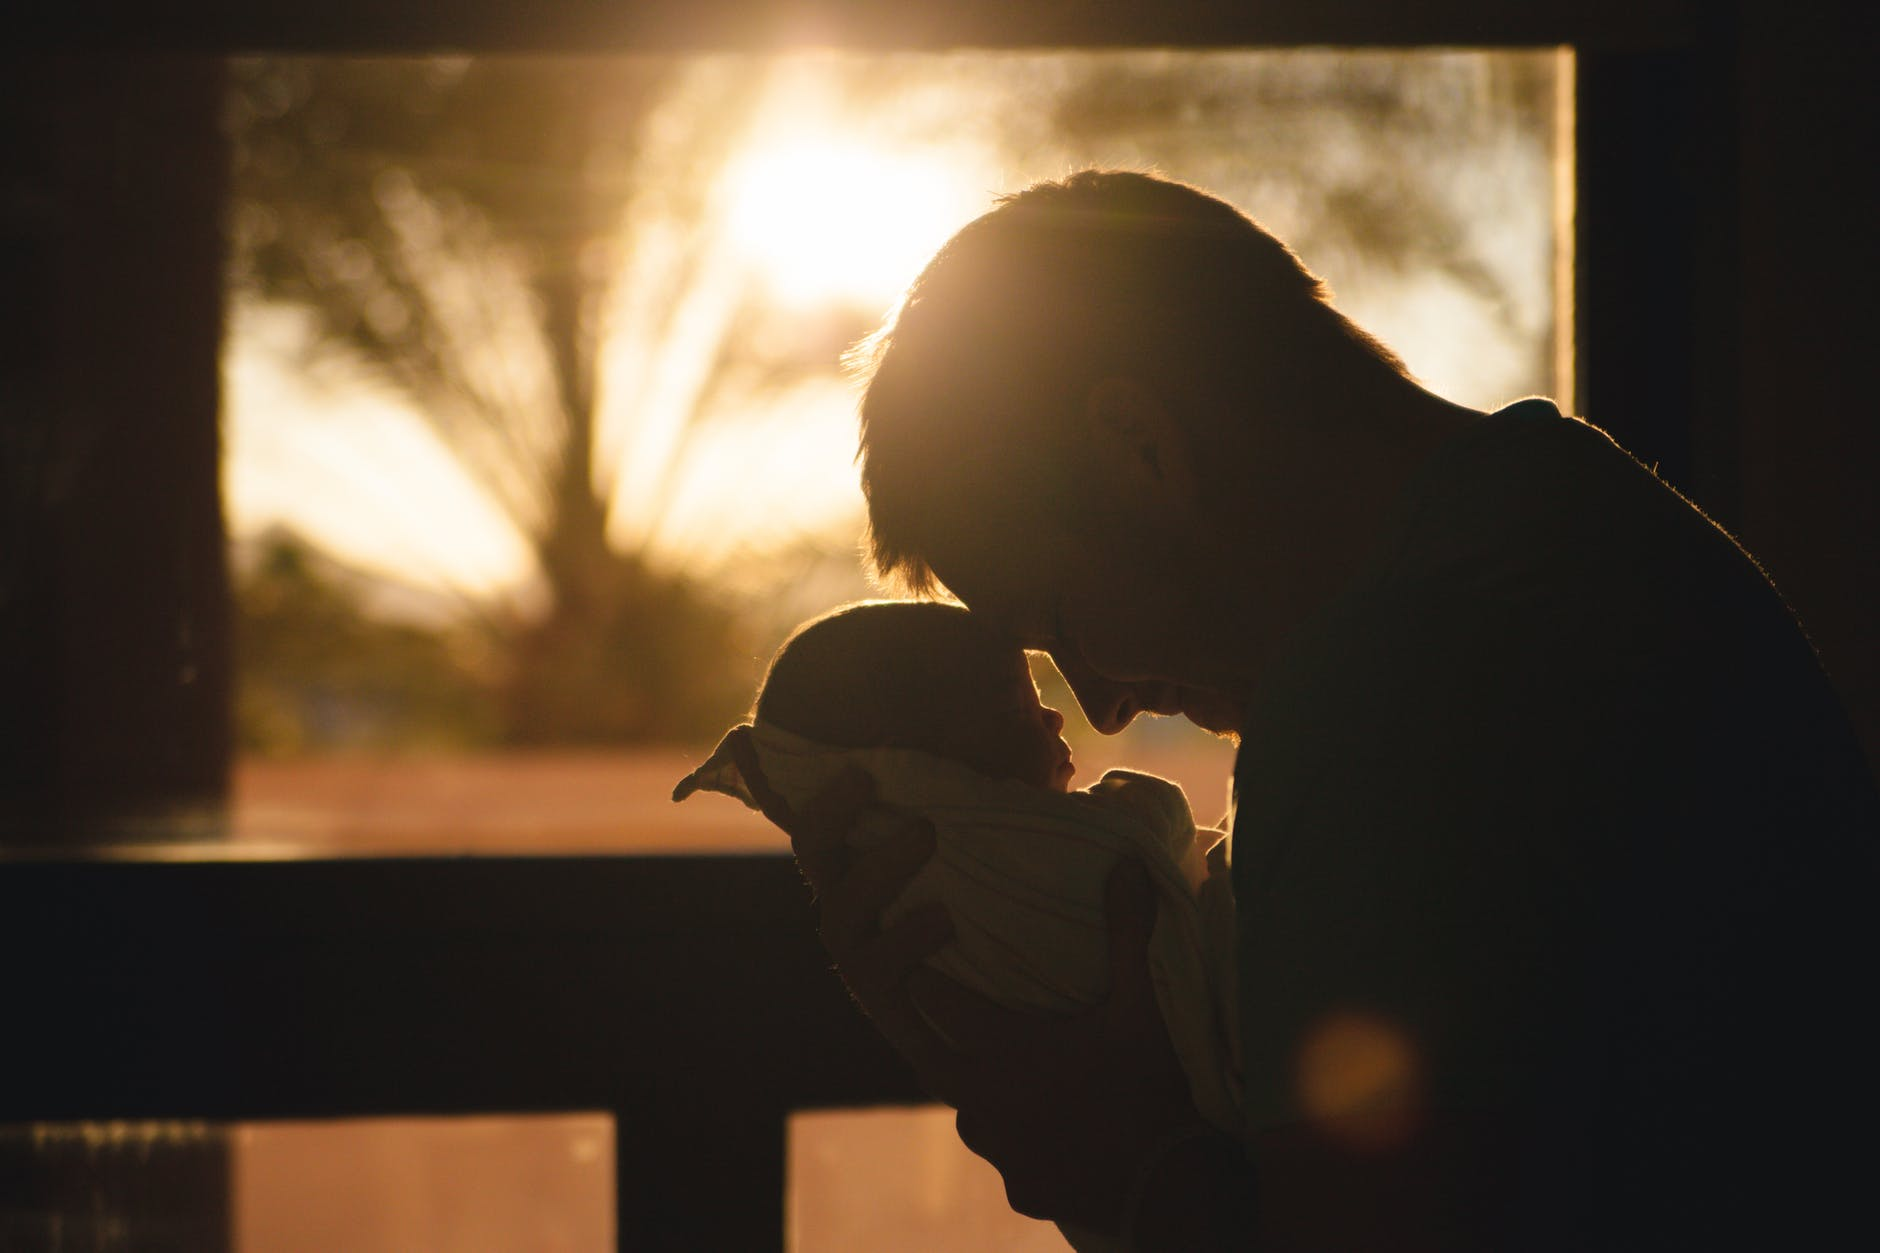 babalar günü mesajları, fathers day messages